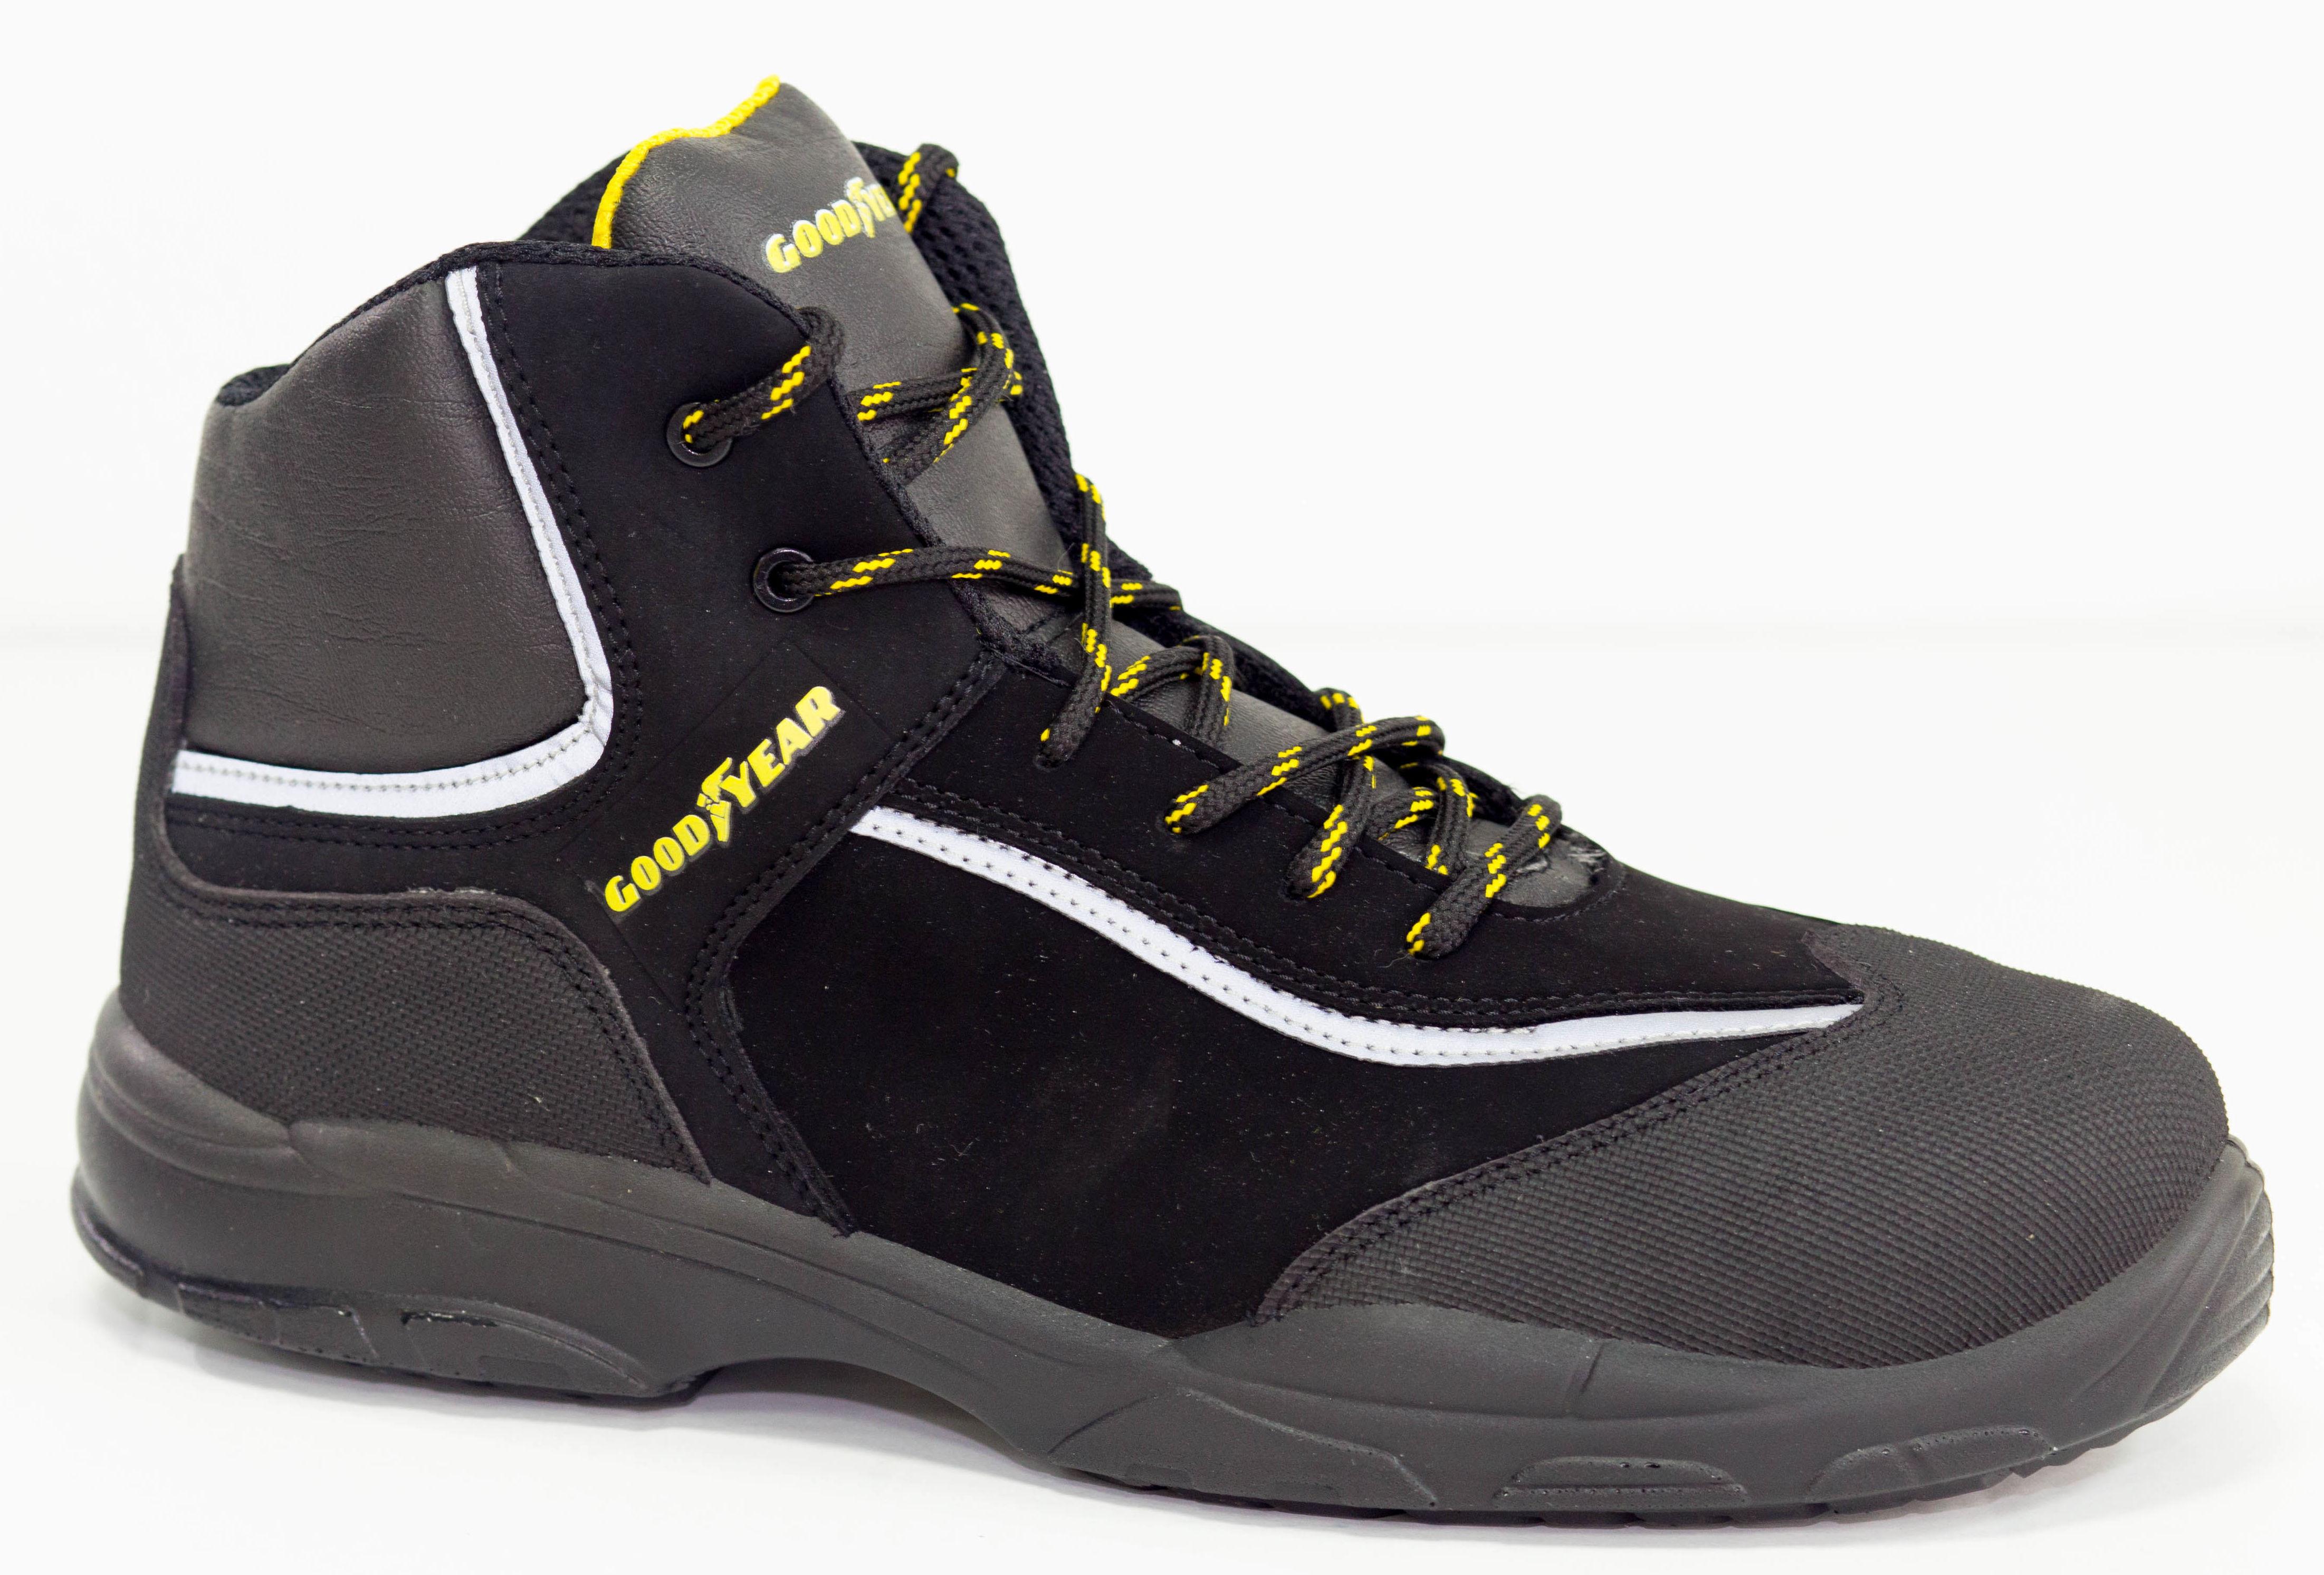 Bota deportiva Goodyear G1388602: Productos de Gamo Vestuario Laboral